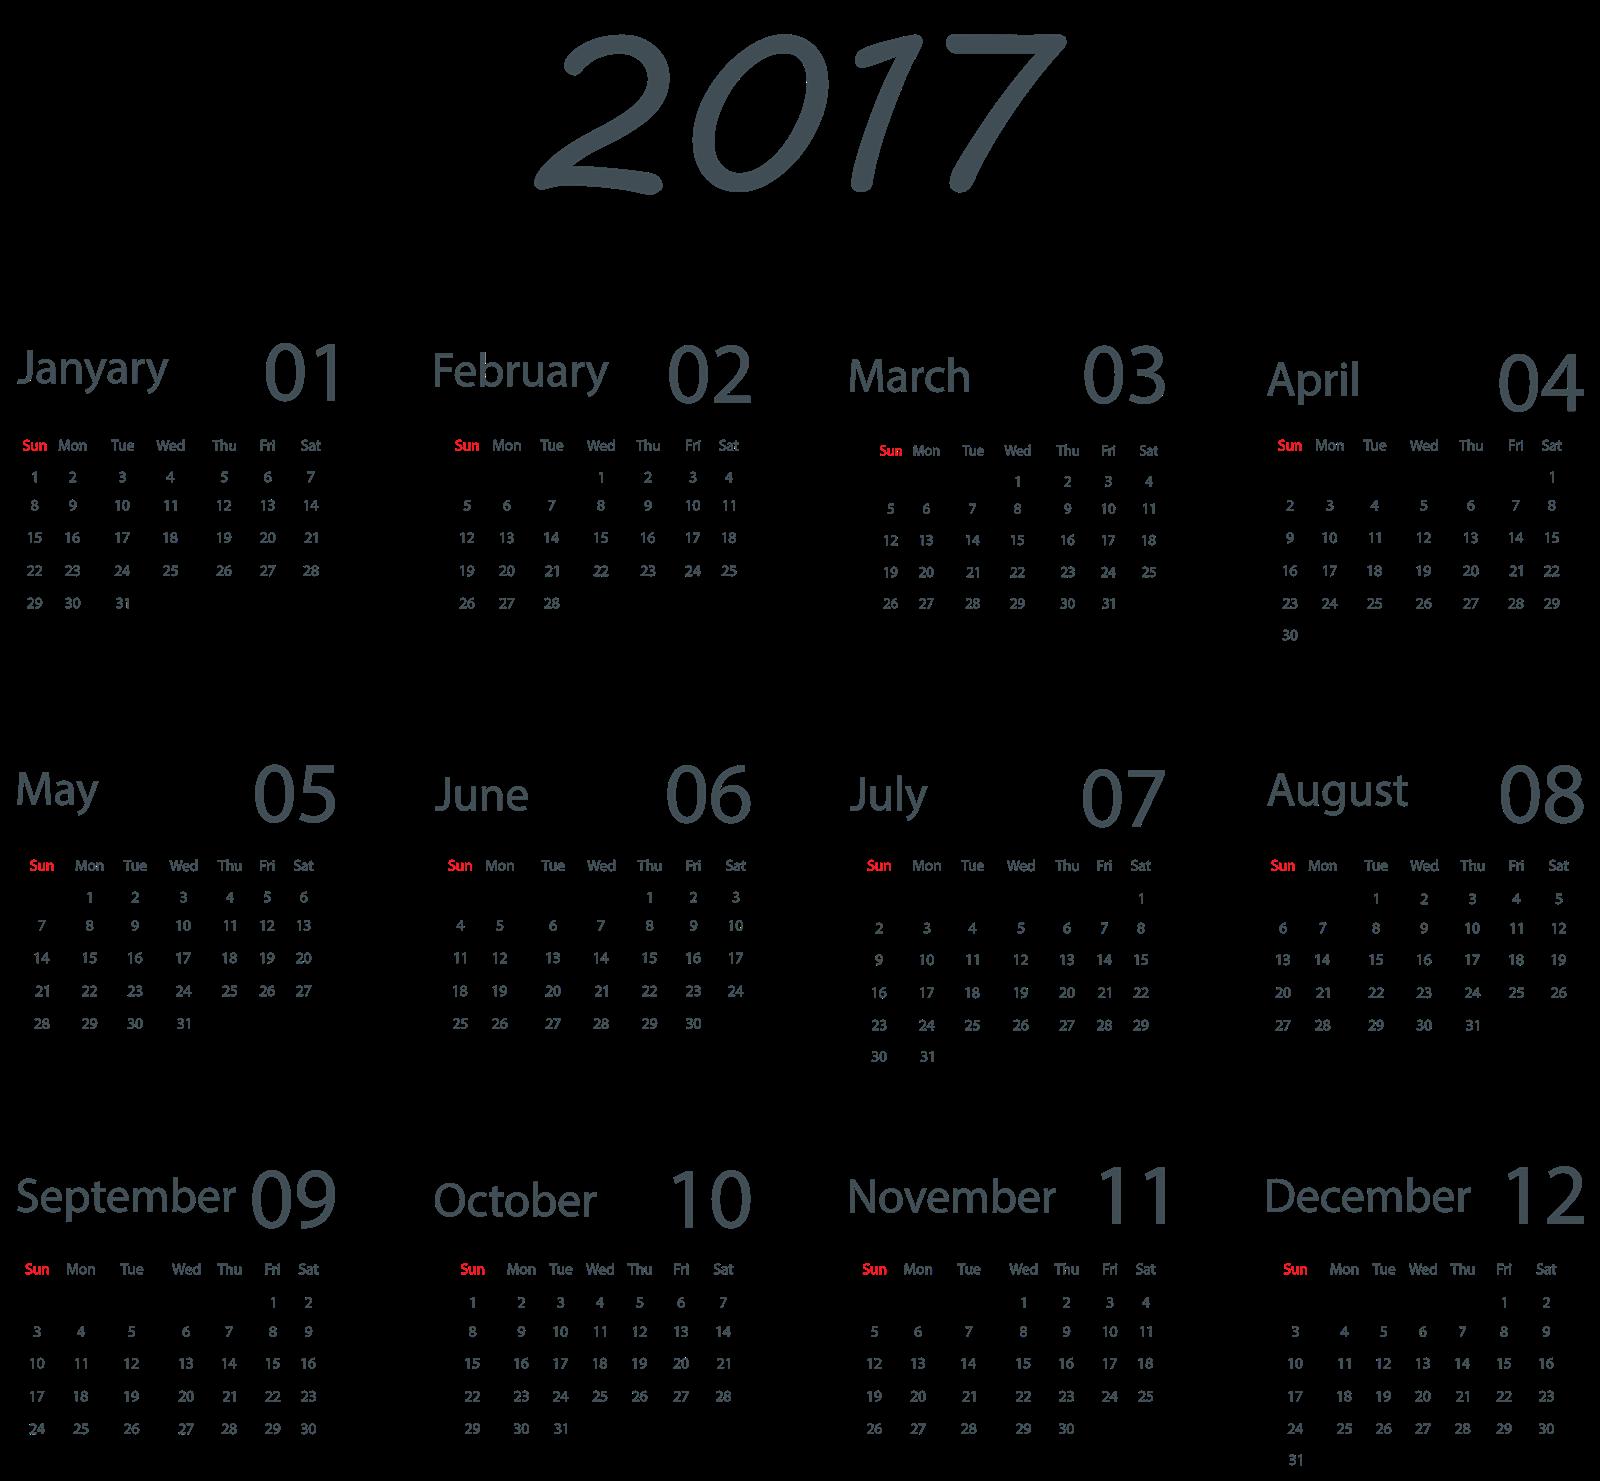 October calendar pictures clipart clipart transparent download 2017 Calendar PNG Transparent Images | PNG All clipart transparent download